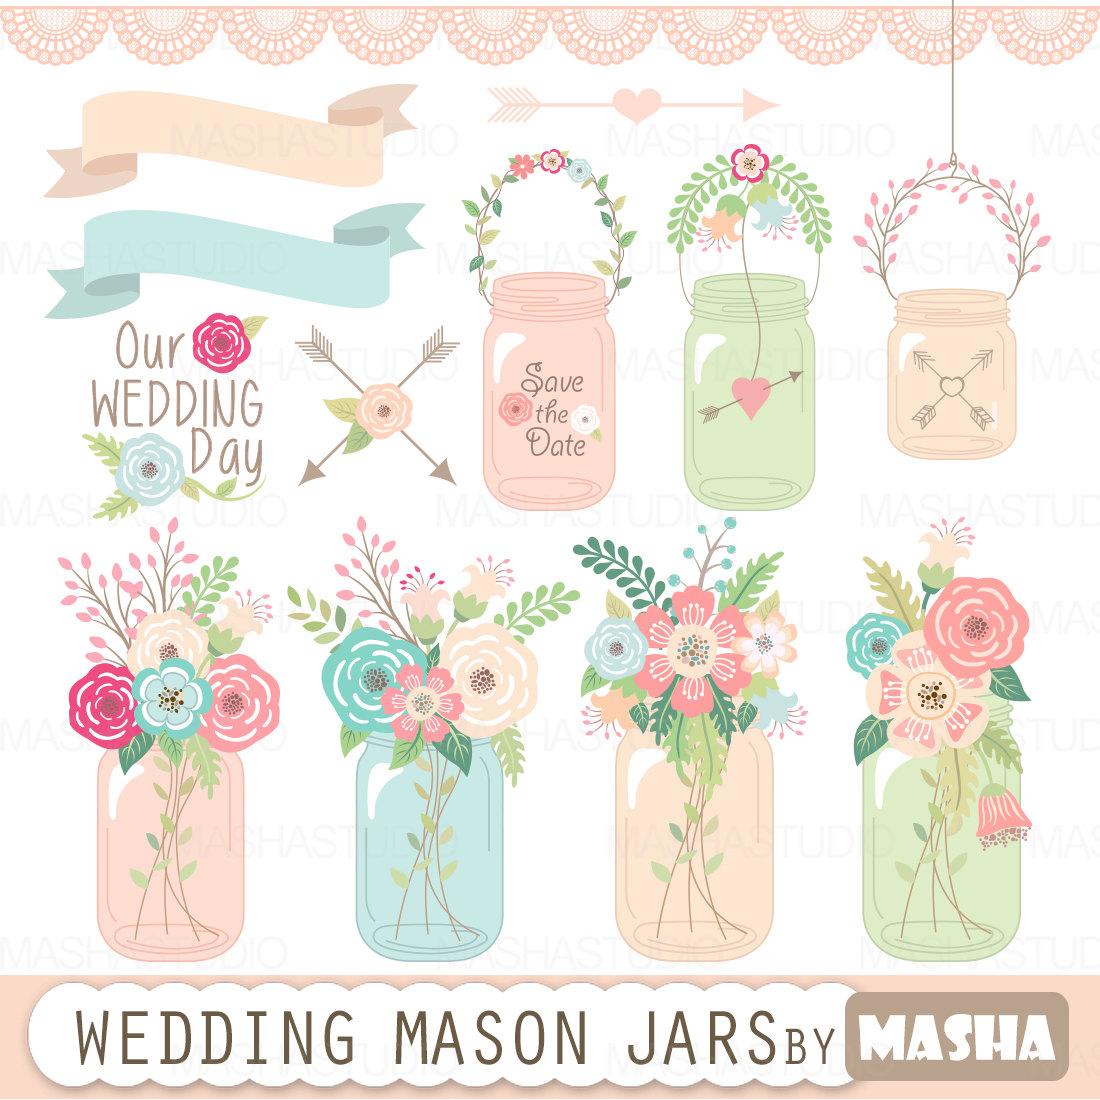 Background clipart mason jar #4